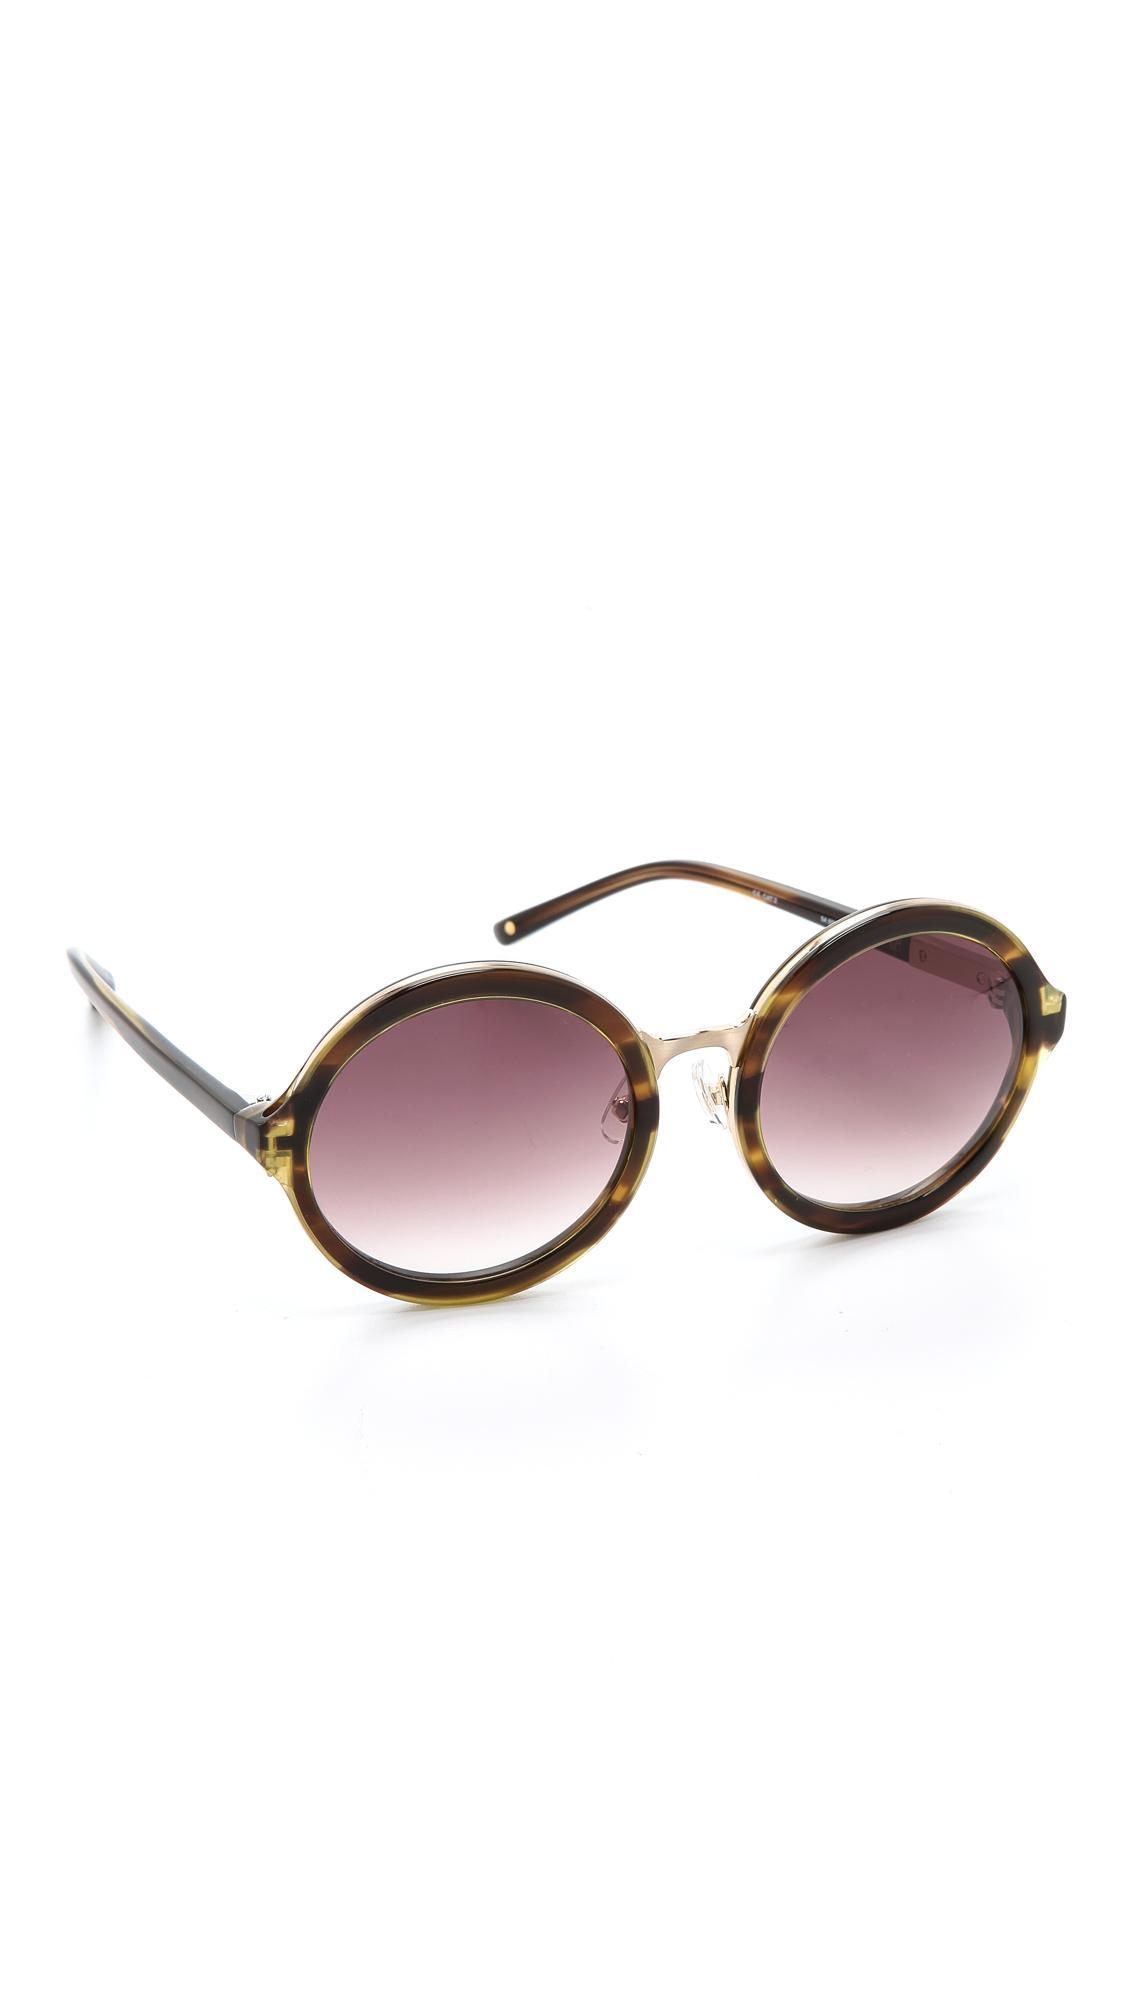 Phillip Lim Cat Eye Sunglasses